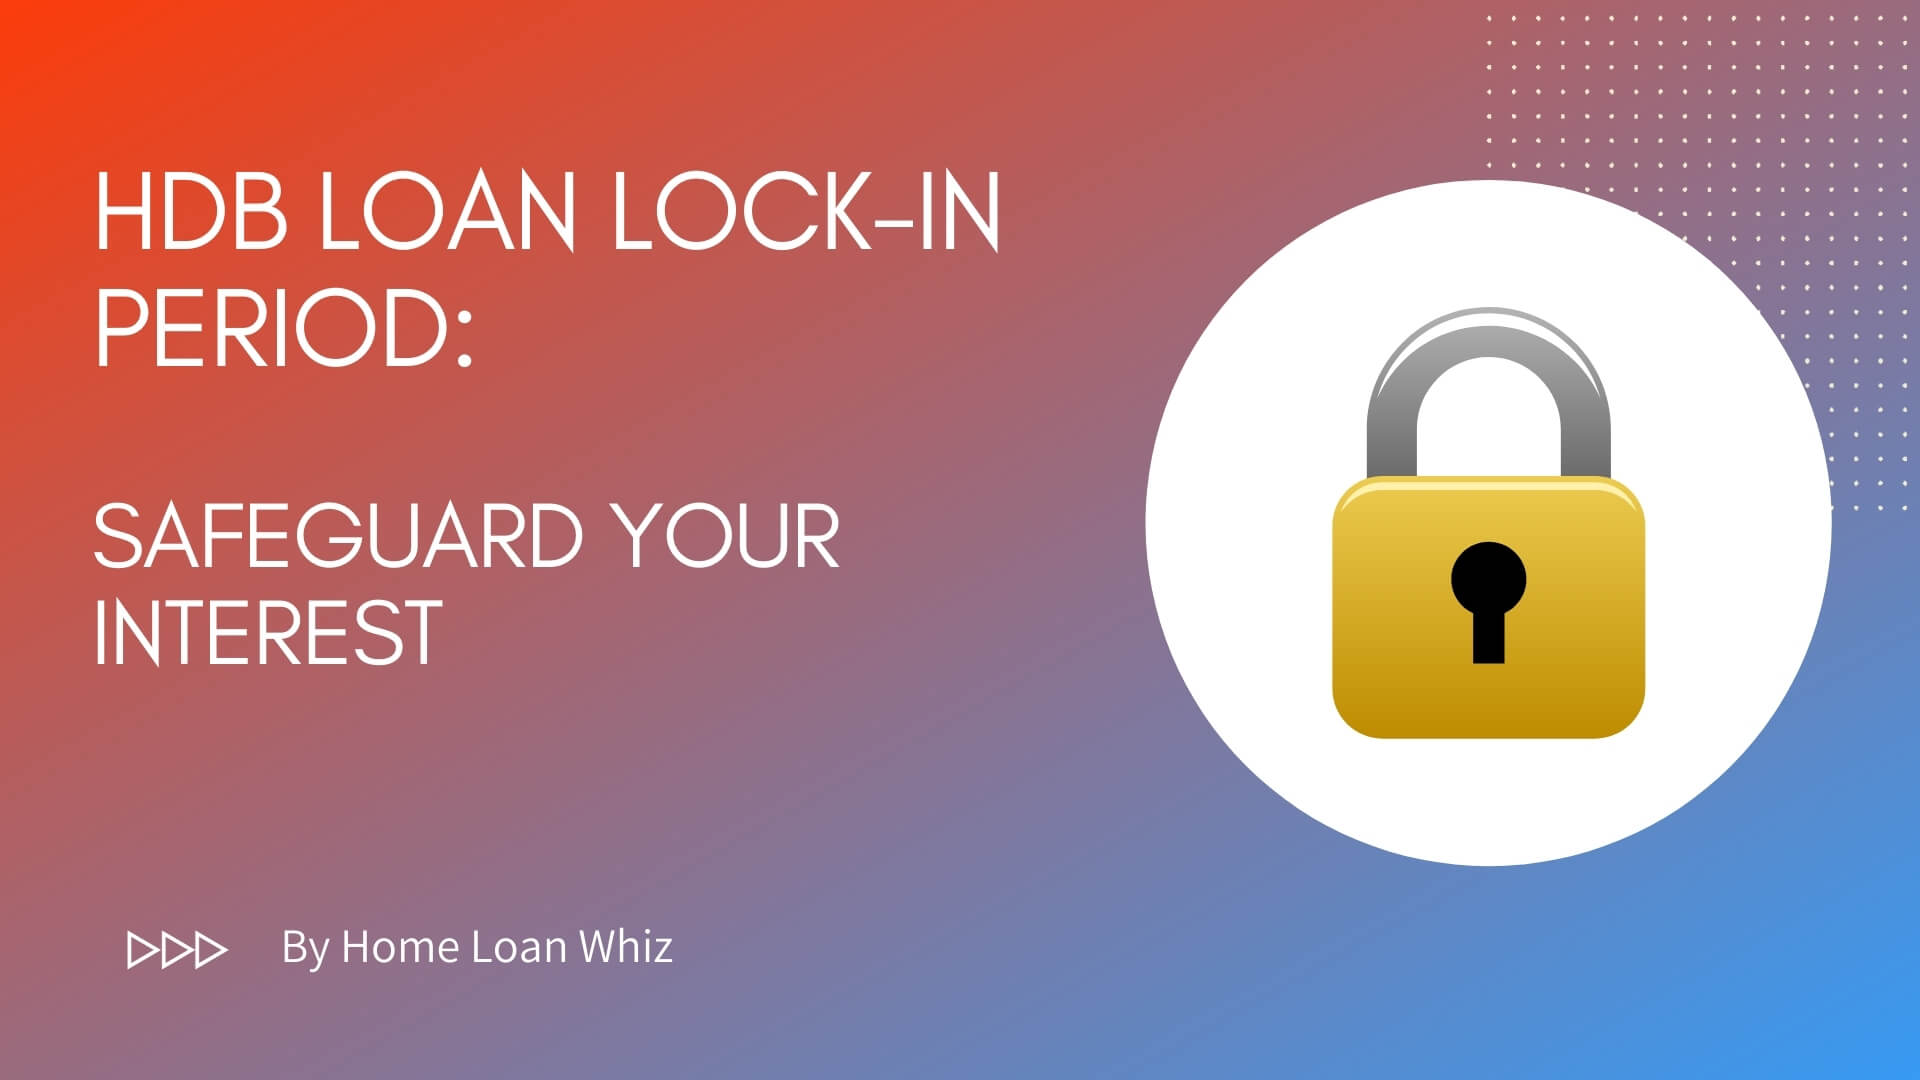 hdb loan lock in period